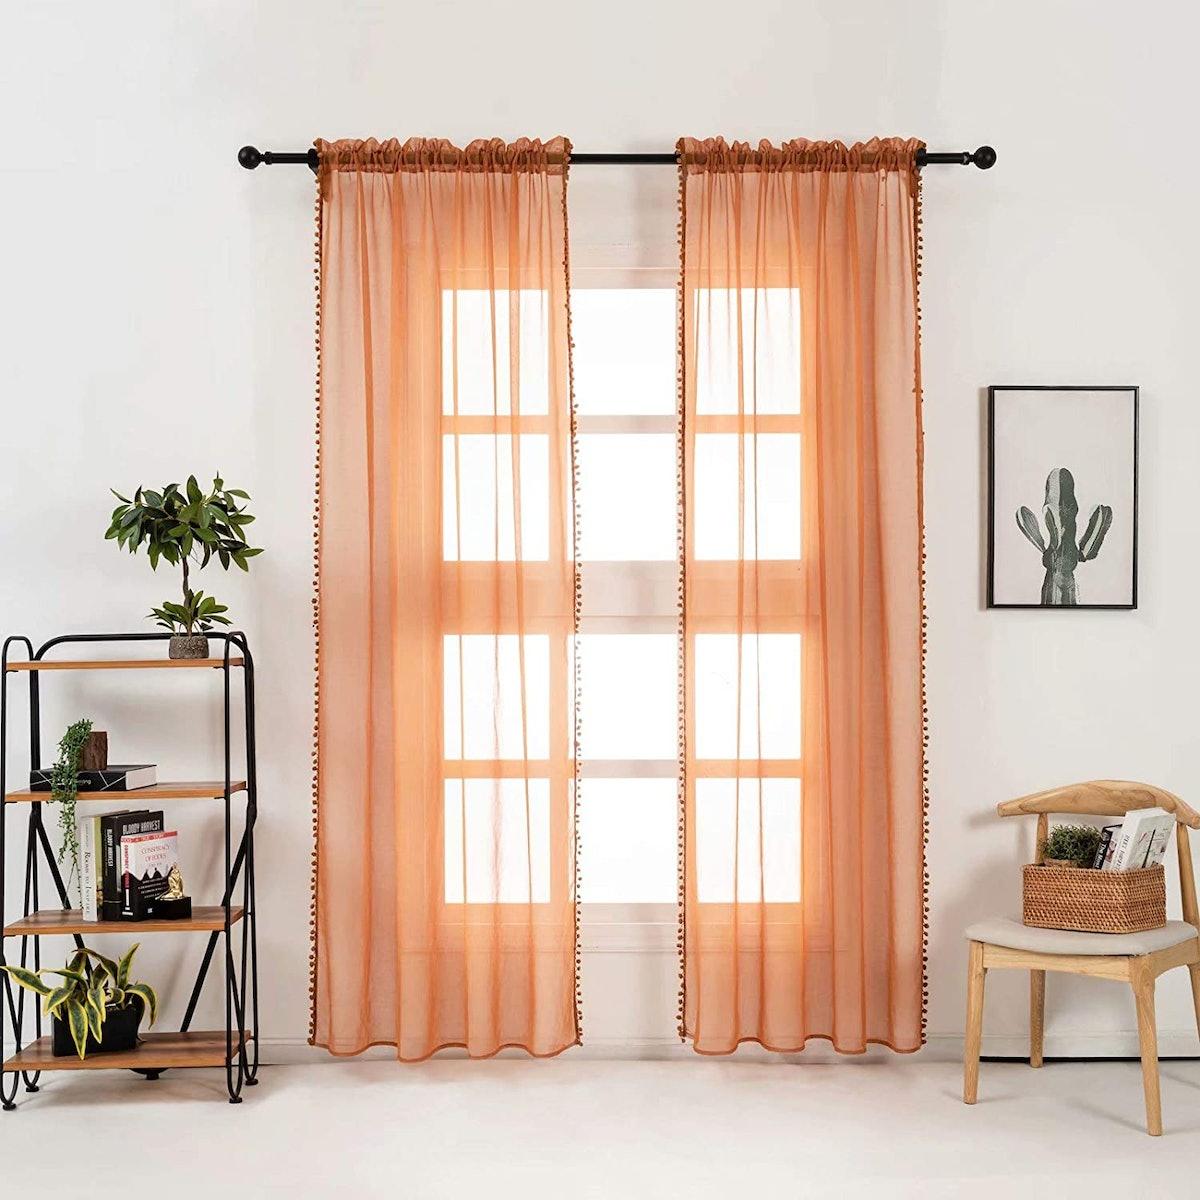 Selectex Pom Pom Sheer Curtains (2-Pack)